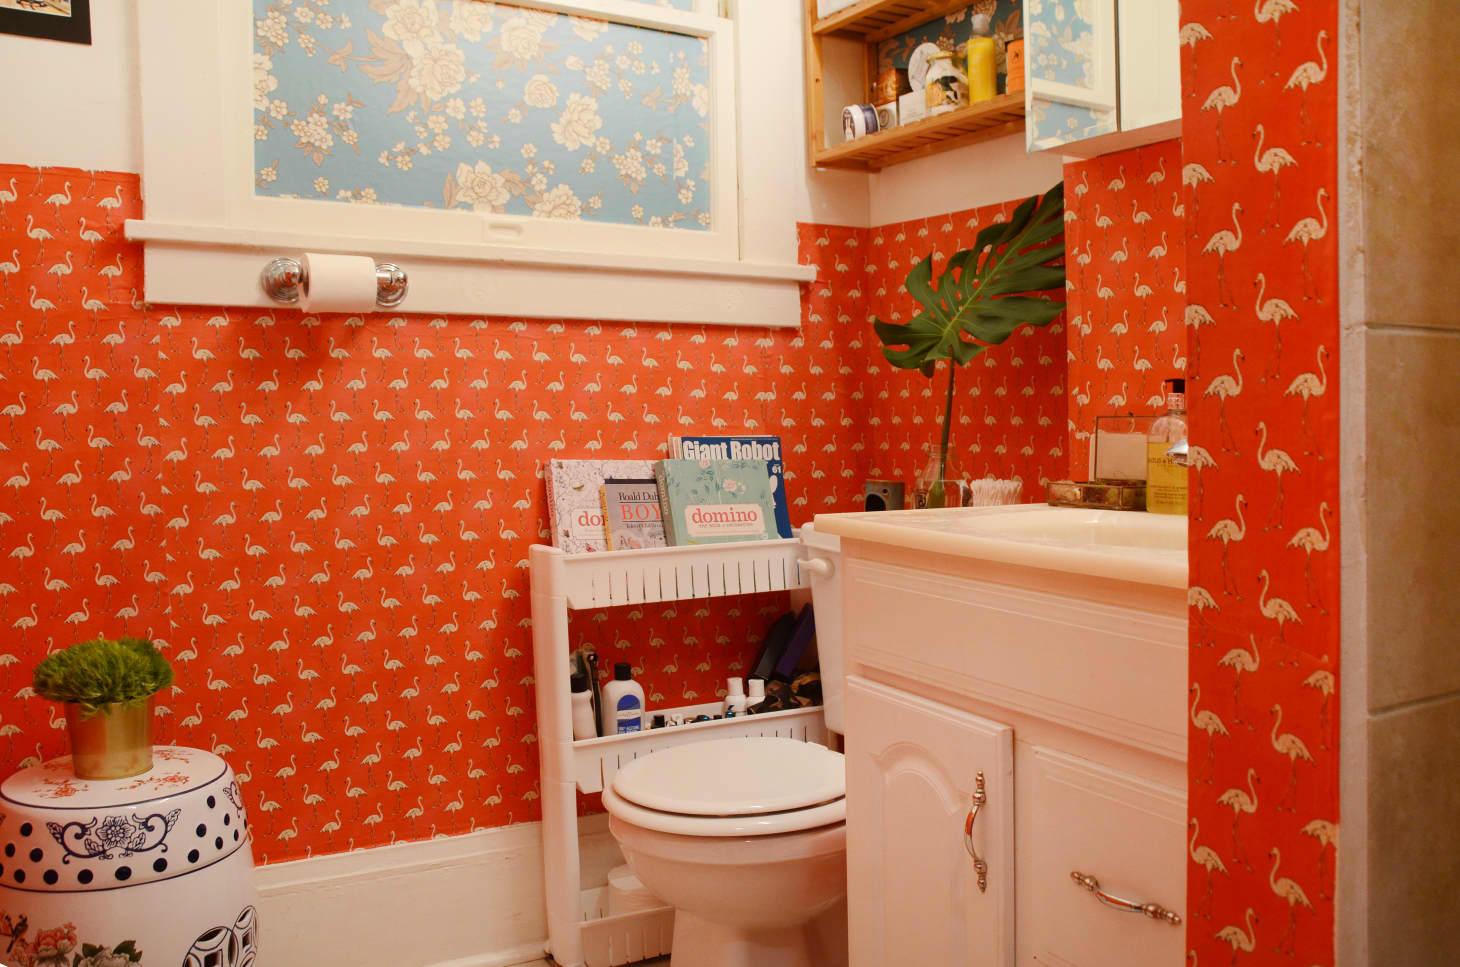 25 Small Bathroom Storage & Design Ideas - Storage ... on Small Apartment Bathroom Storage Ideas  id=32213